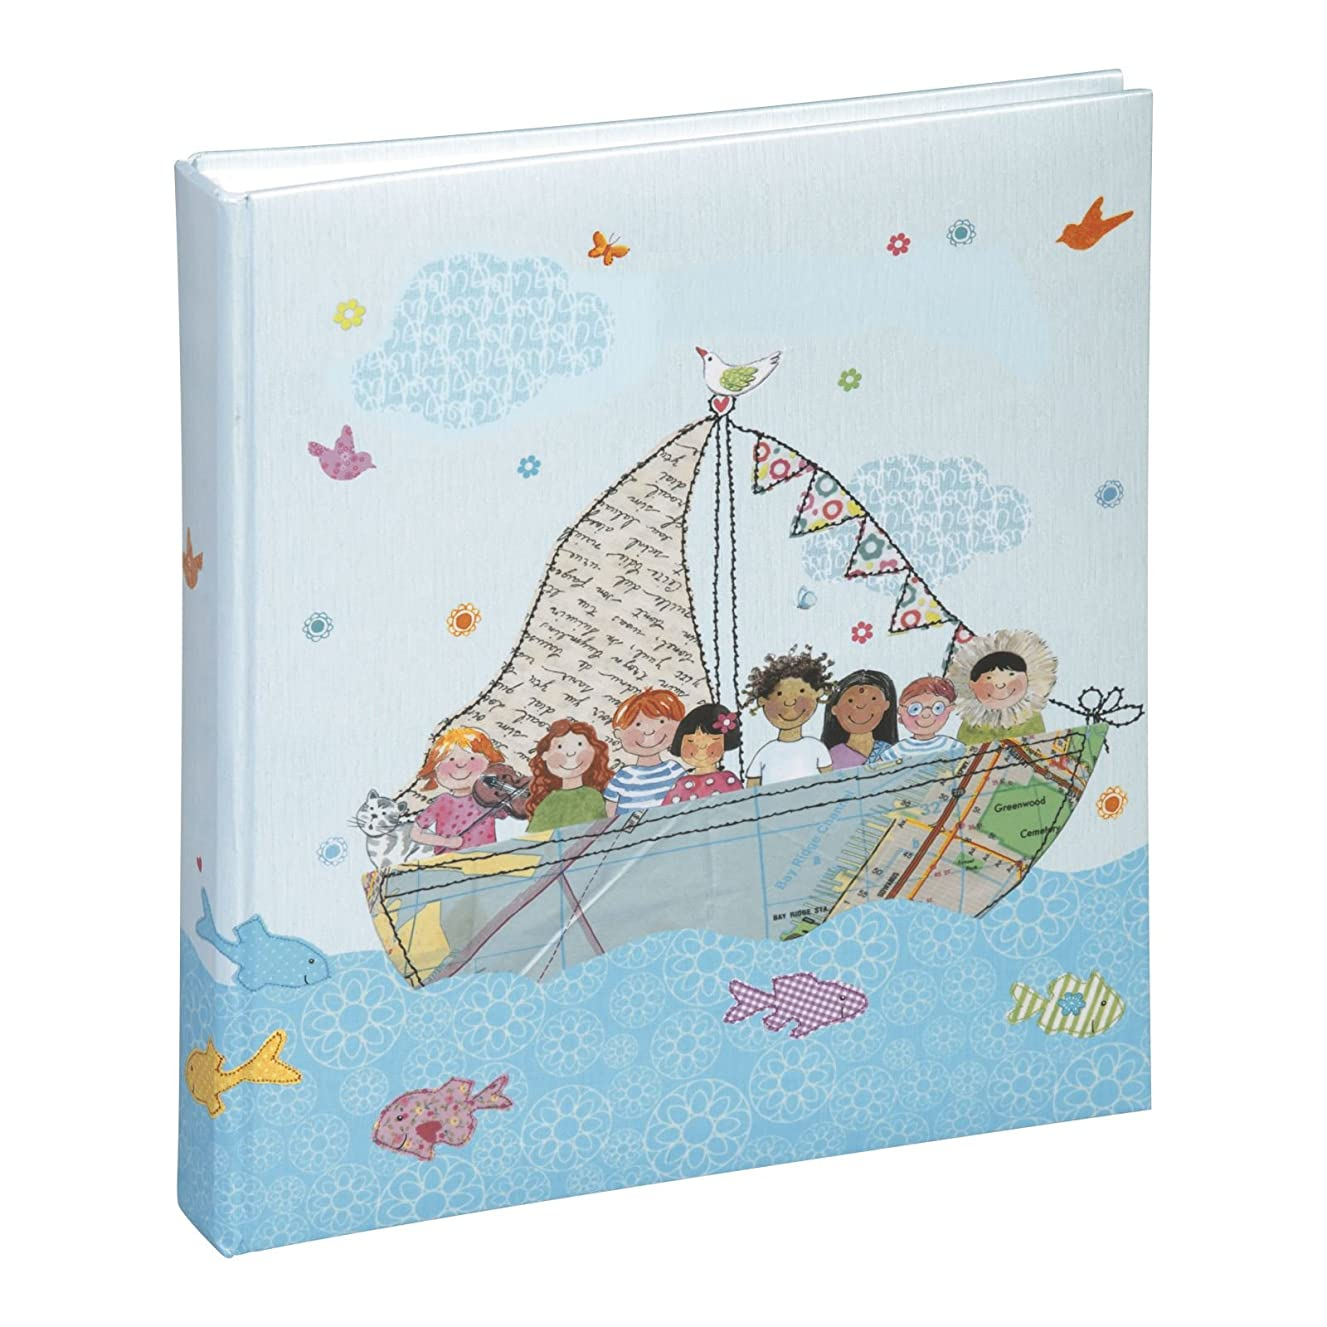 Pagna 11078?Baby Photo Album 210?x 250?mm Cardboard Cover World 40S, 21.5?x 25.0?x 3.2?cm